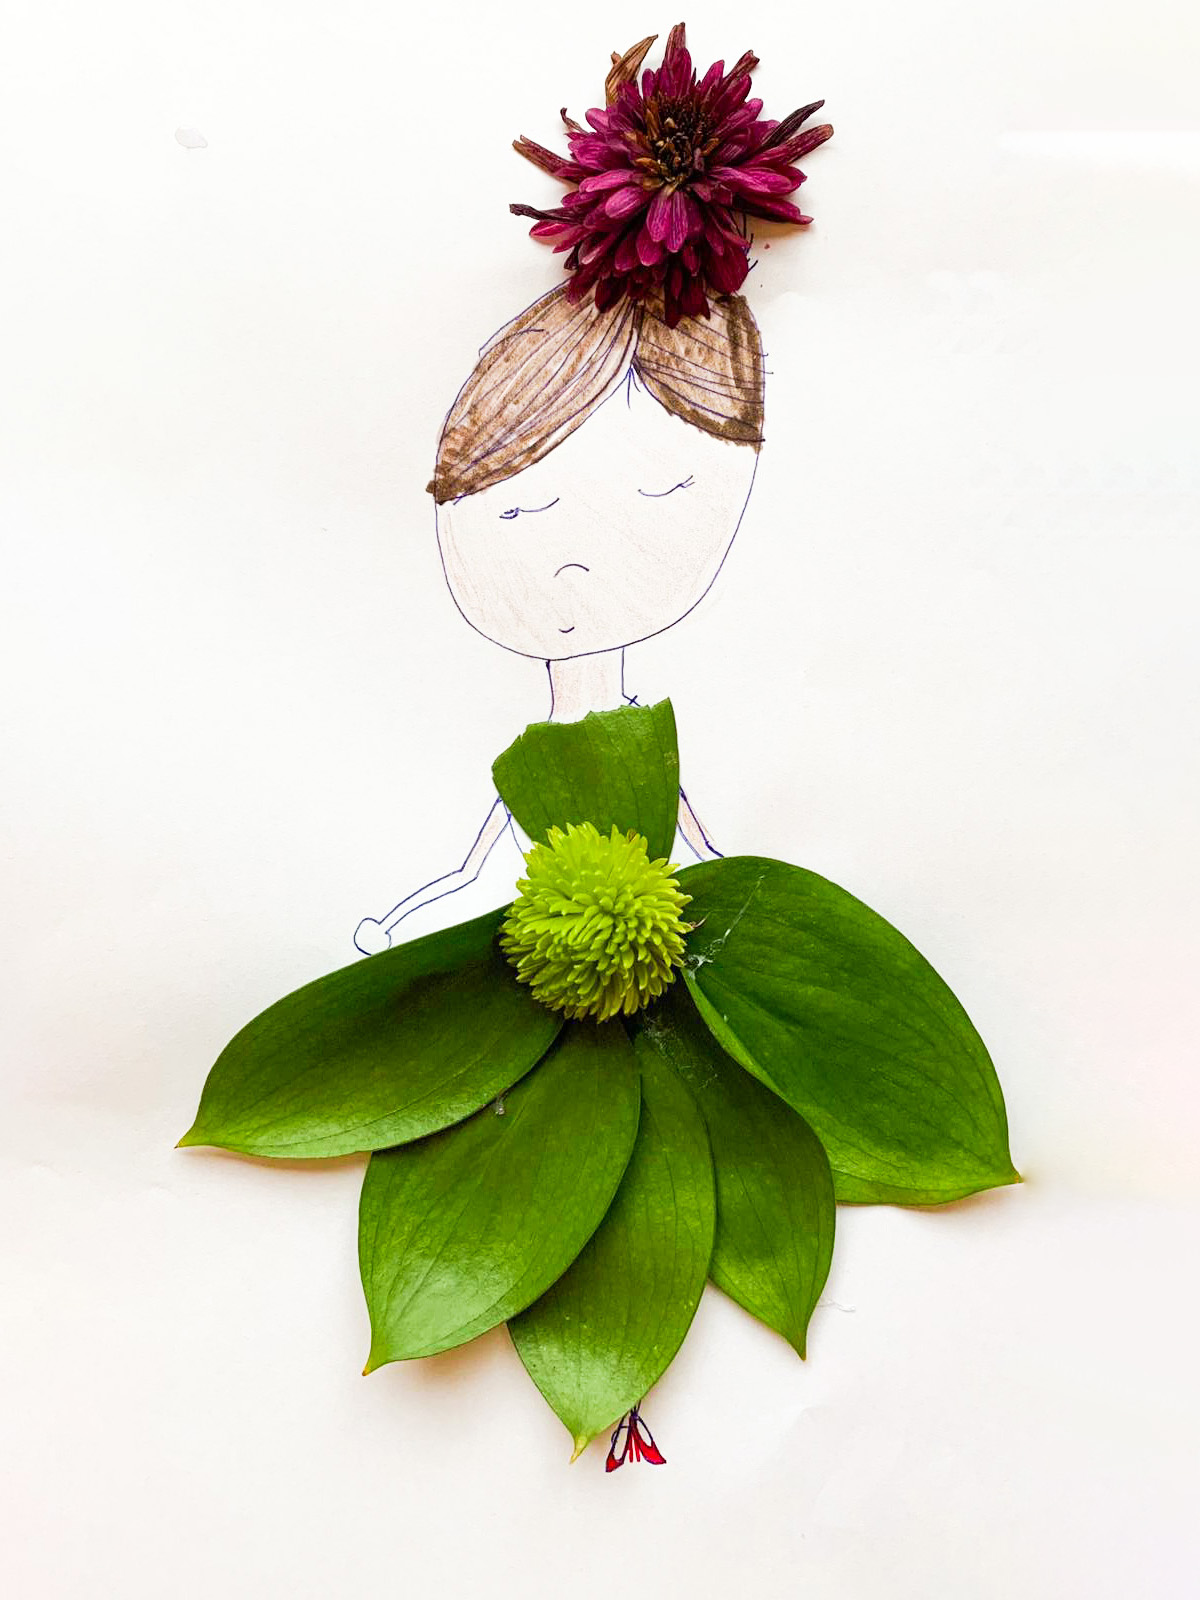 Evelina Stembuleae. Primary Ballet